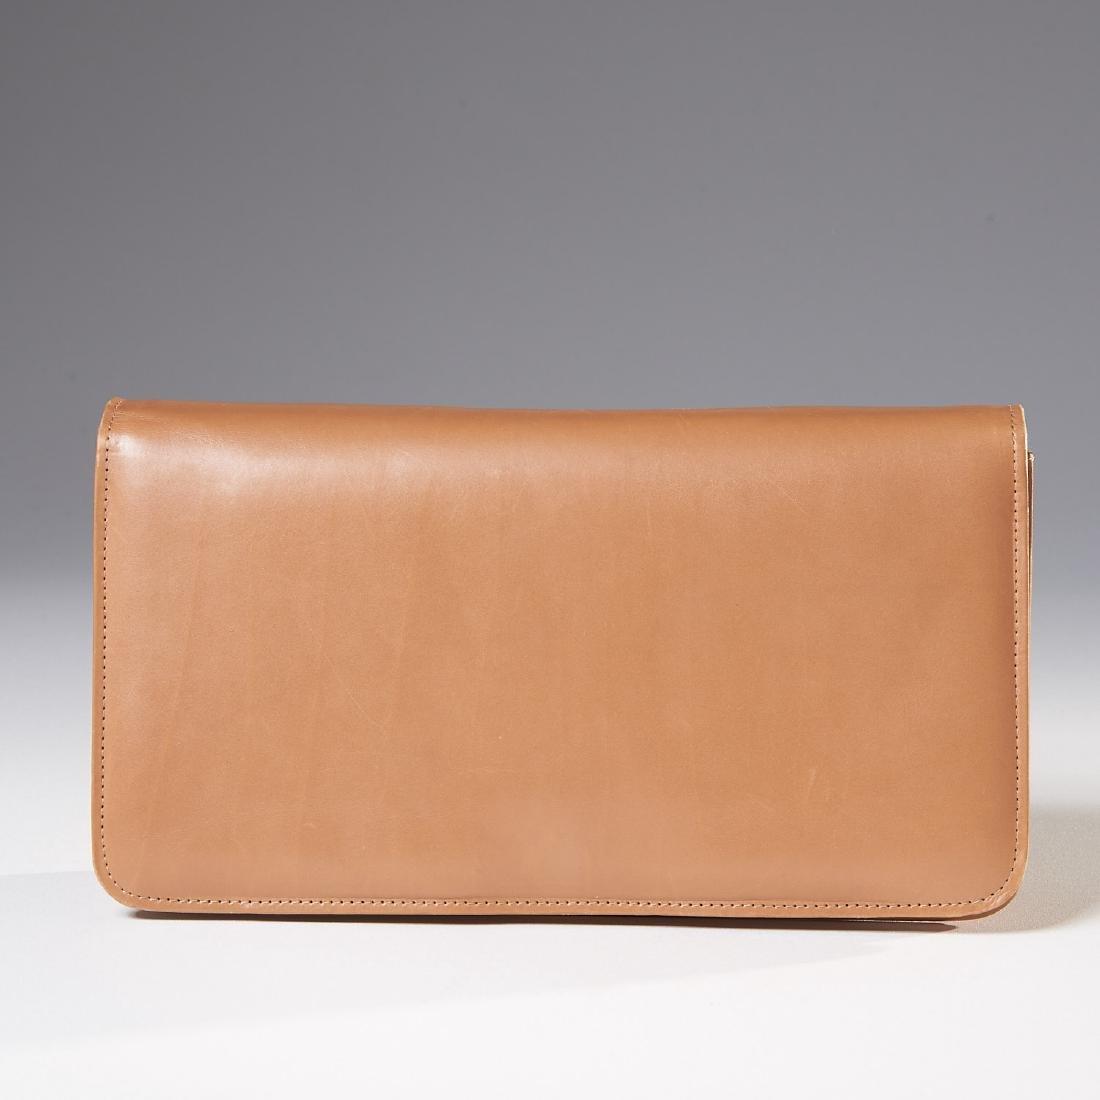 Manolo Blahnik tan lambskin handbag